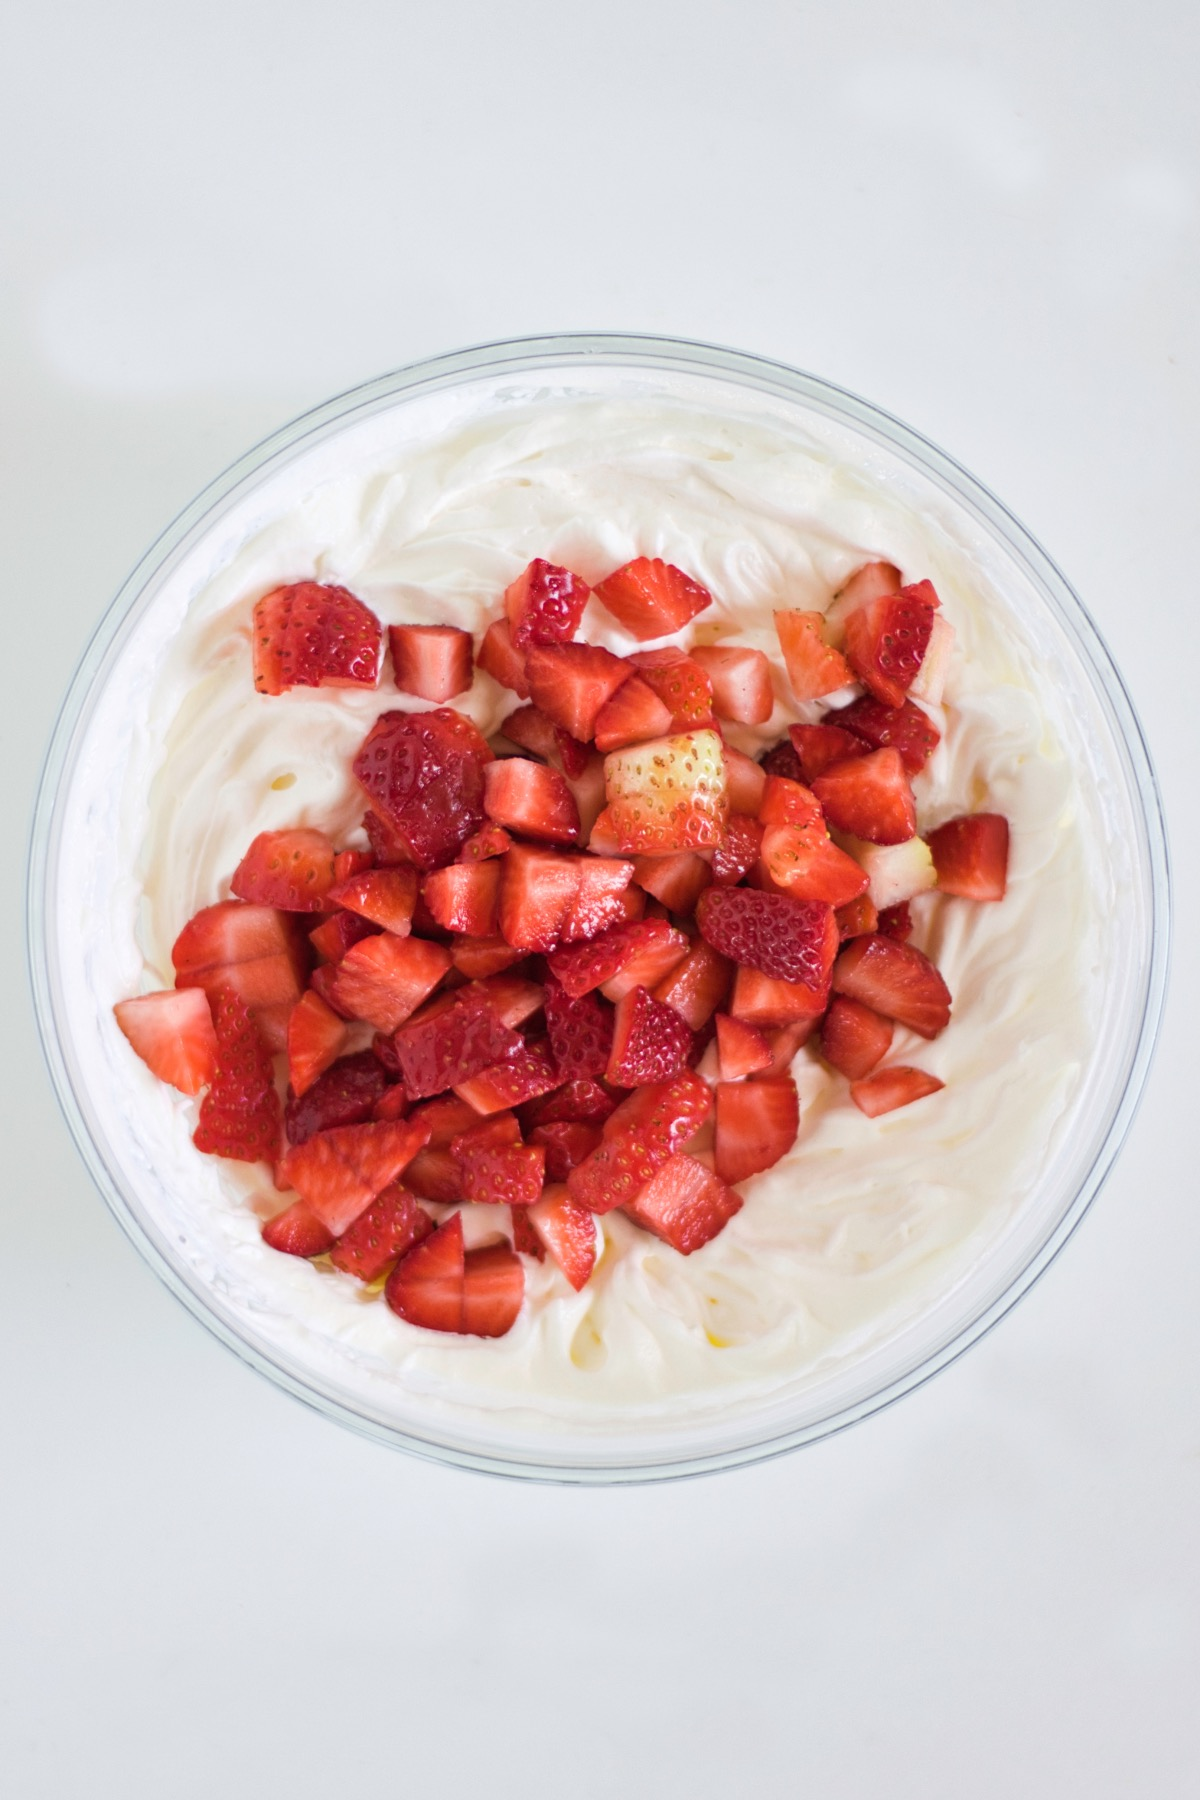 how to mix the strawberries and cream strawberry cream crumble recipe